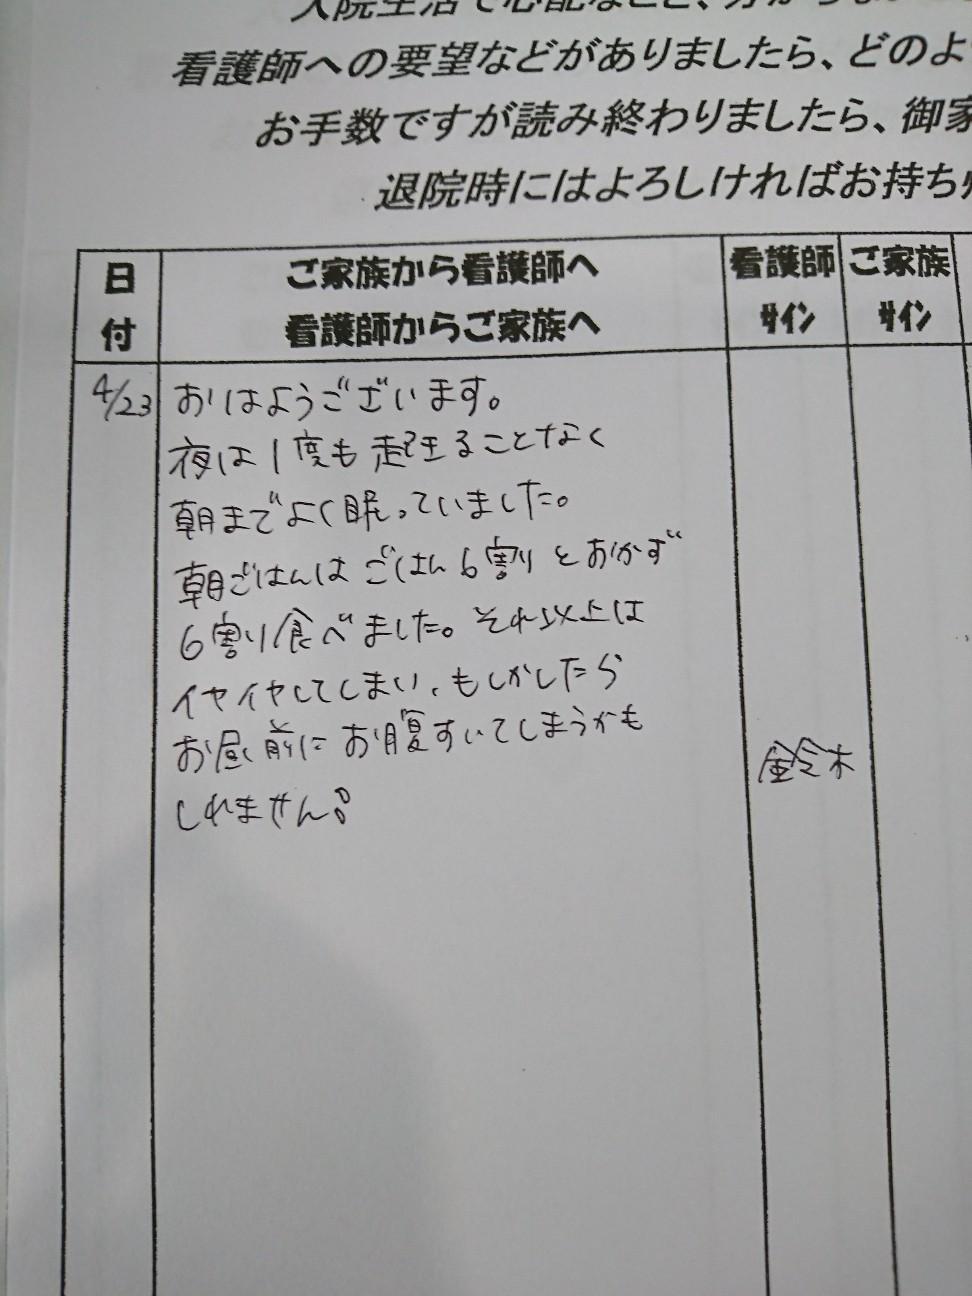 f:id:ankojirushi:20180423092113j:image